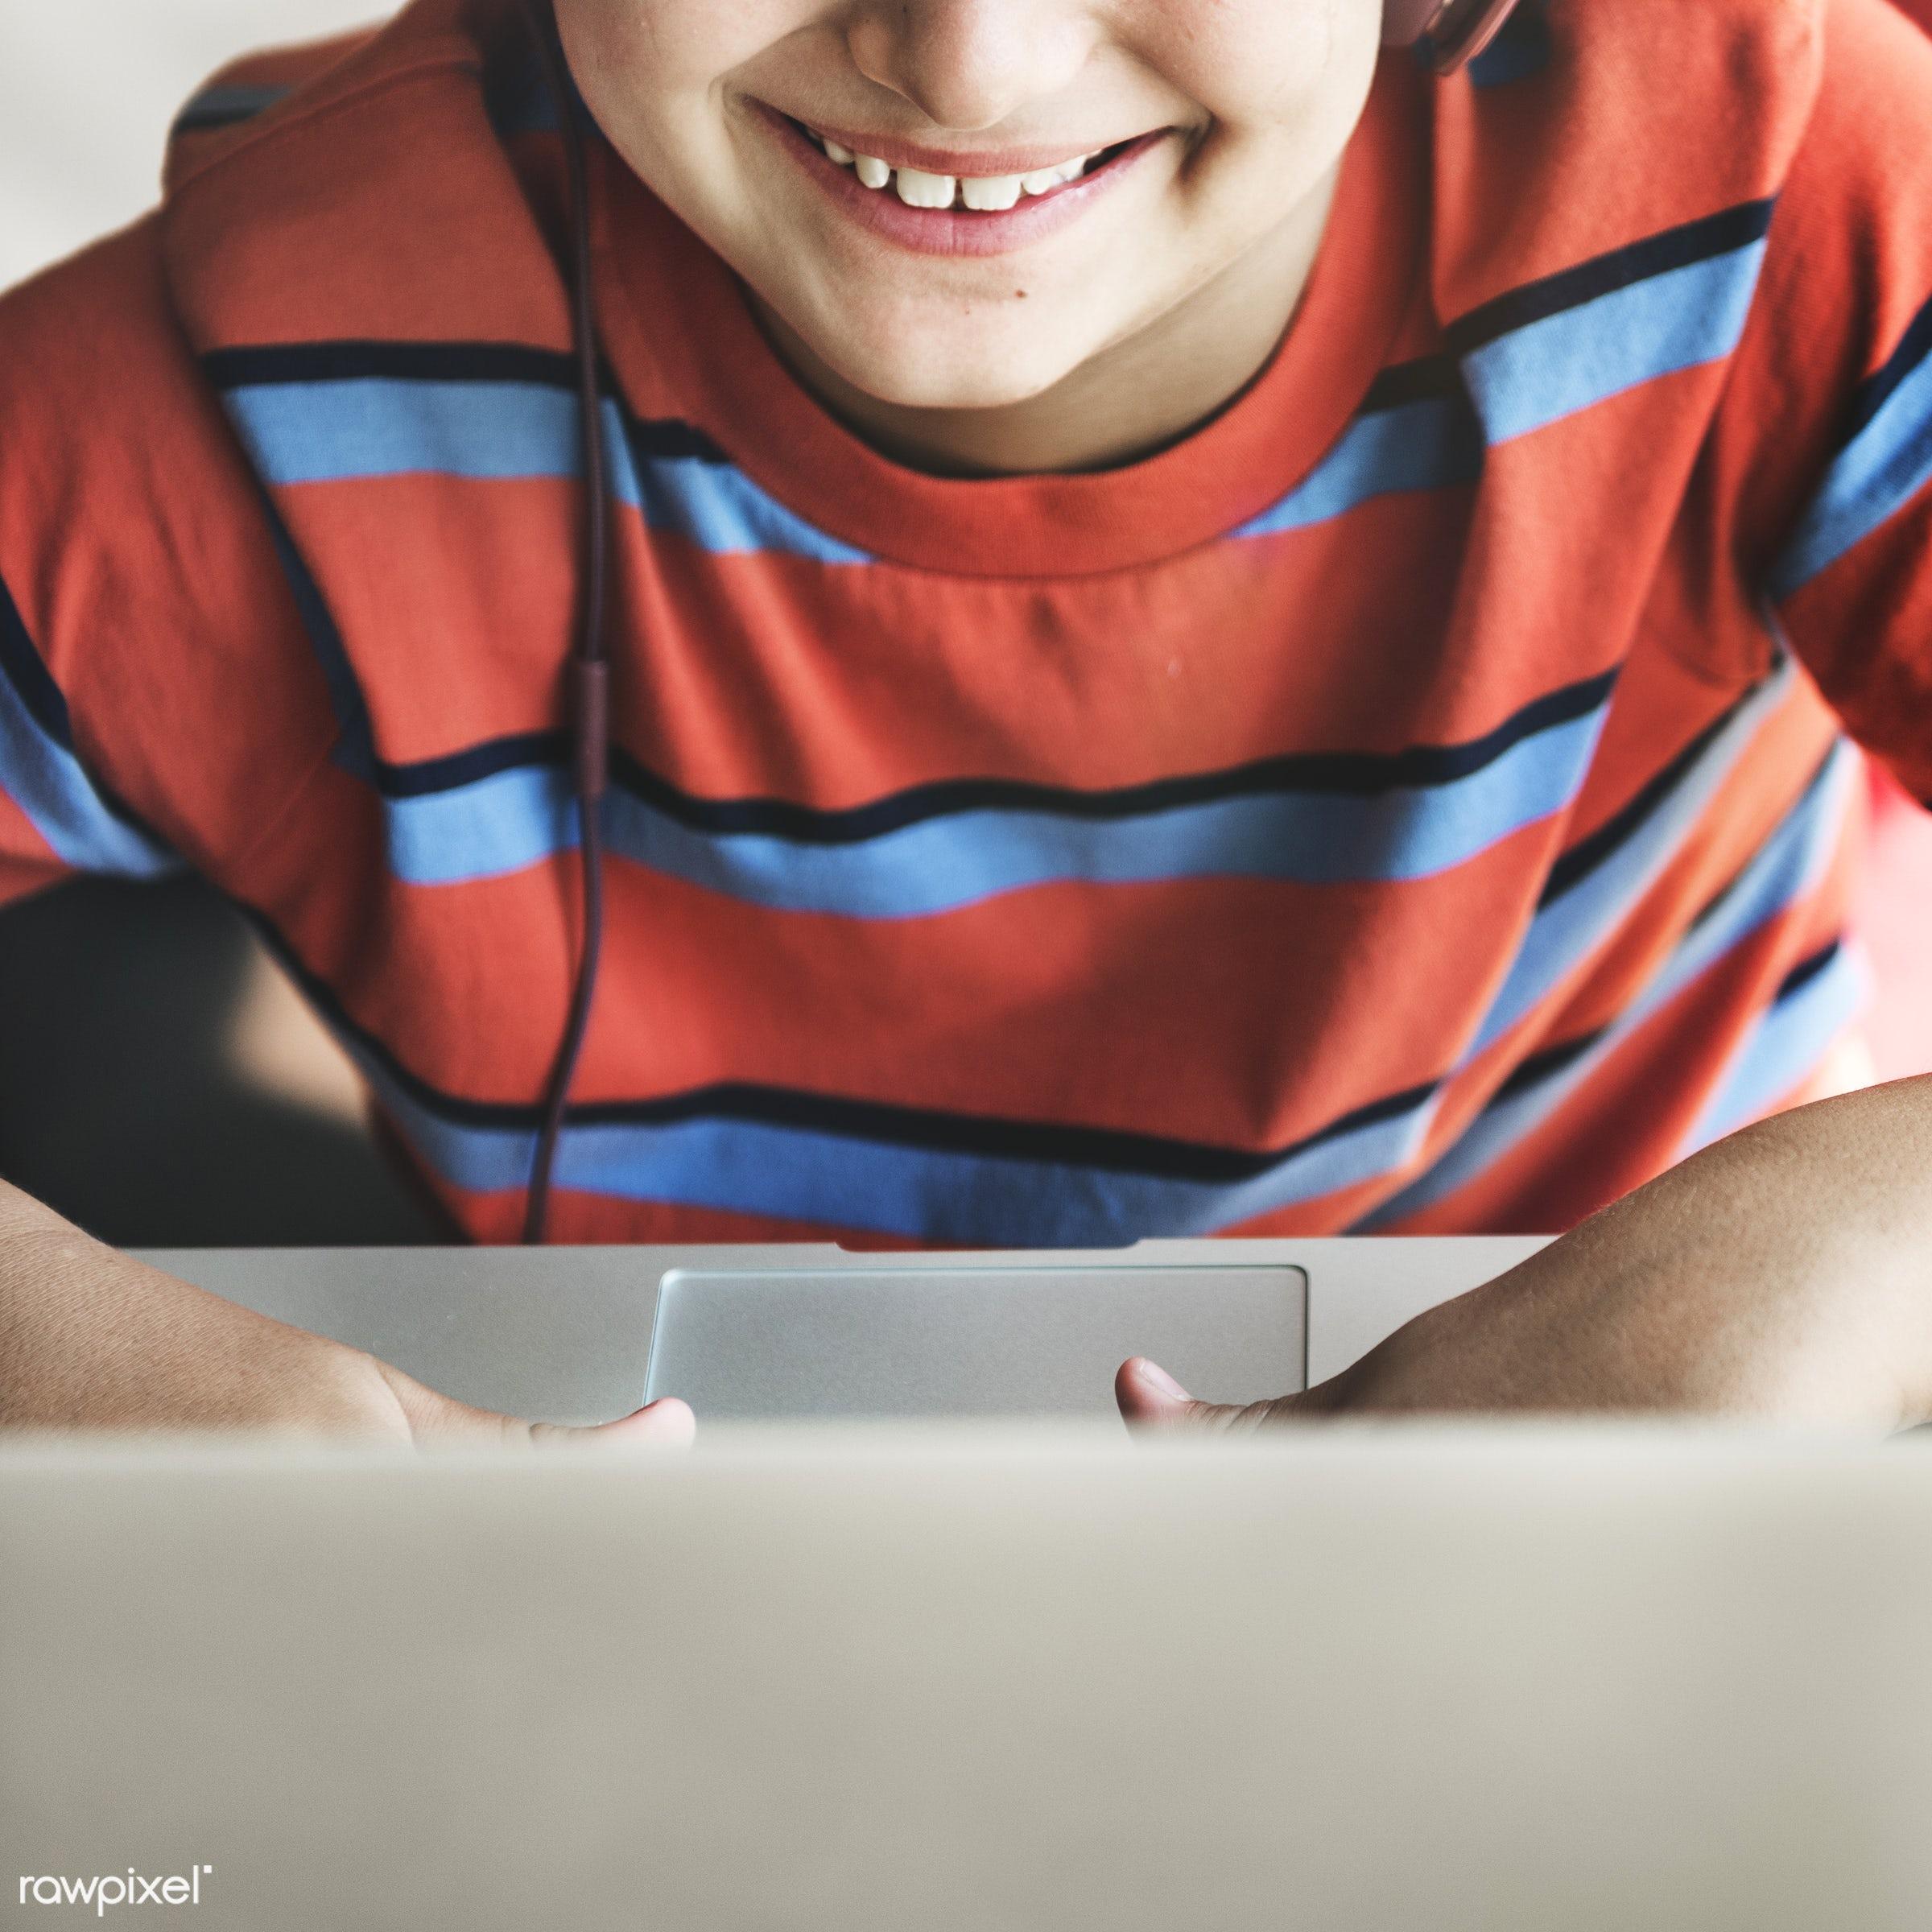 alone, audio, boy, cheerful, child, computer, device, digital, enjoy, entertainment, happiness, headphones, home, house, kid...